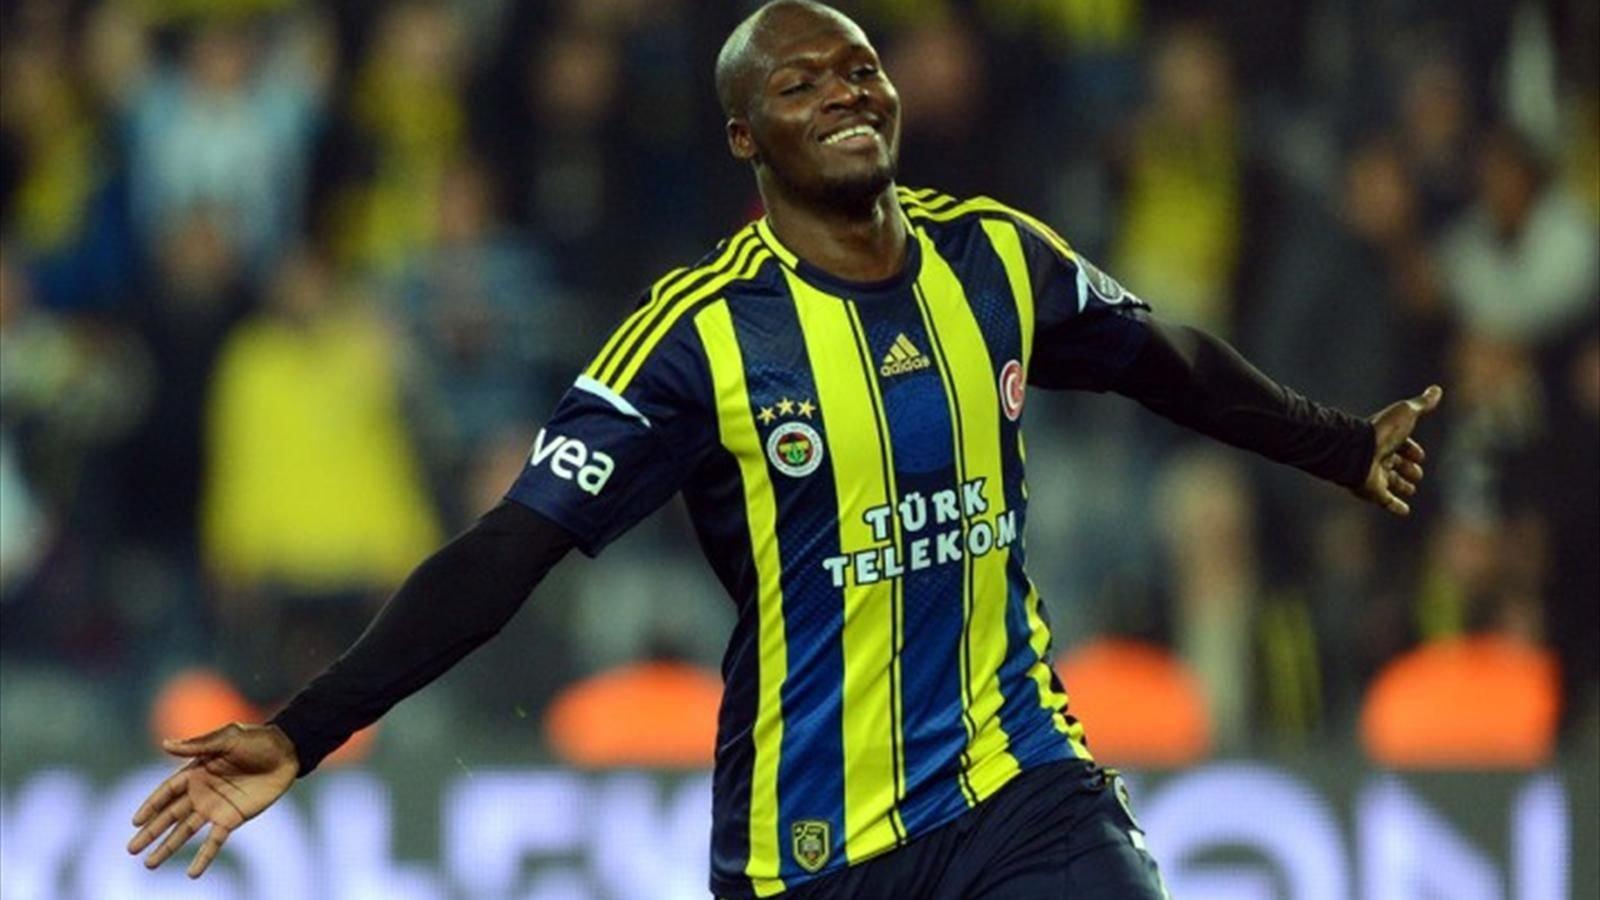 Flaş! Moussa Sow, Süper Lig'e geri dönüyor